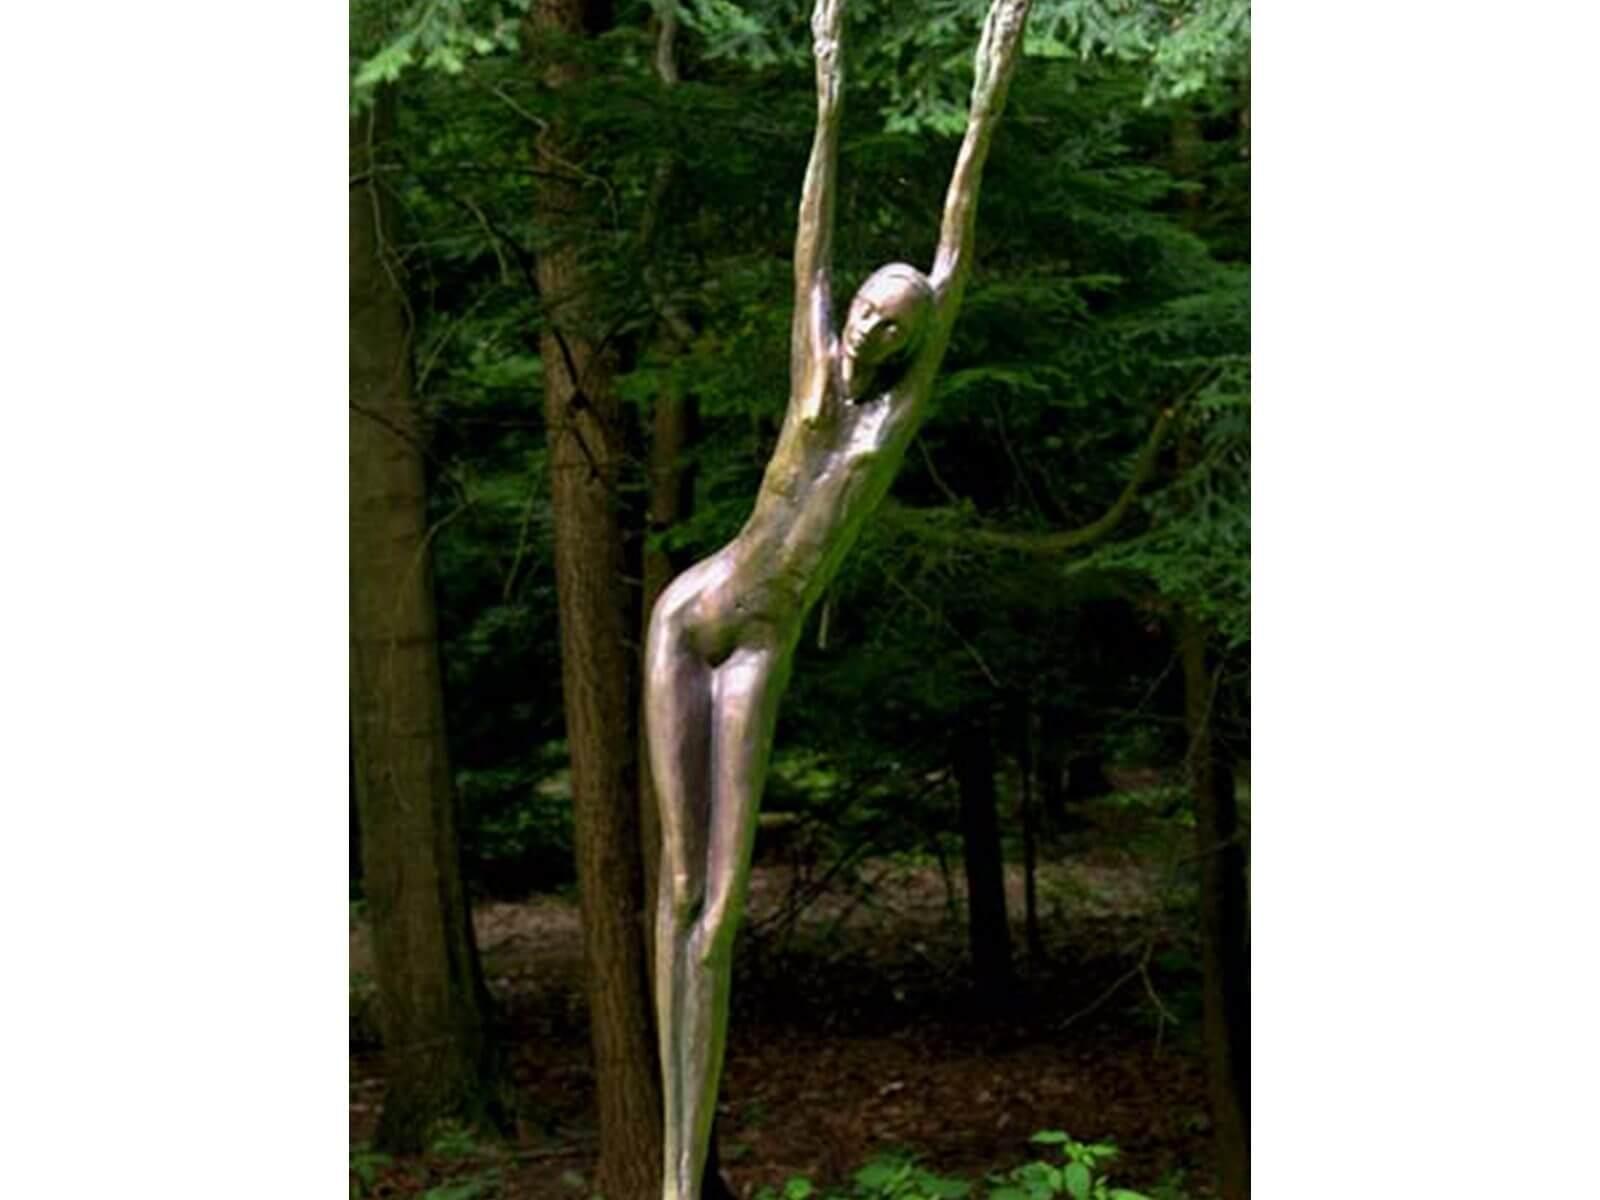 Daphne a Bronze Figurative Outdoor Garden Sculpture by Andrew DeVries